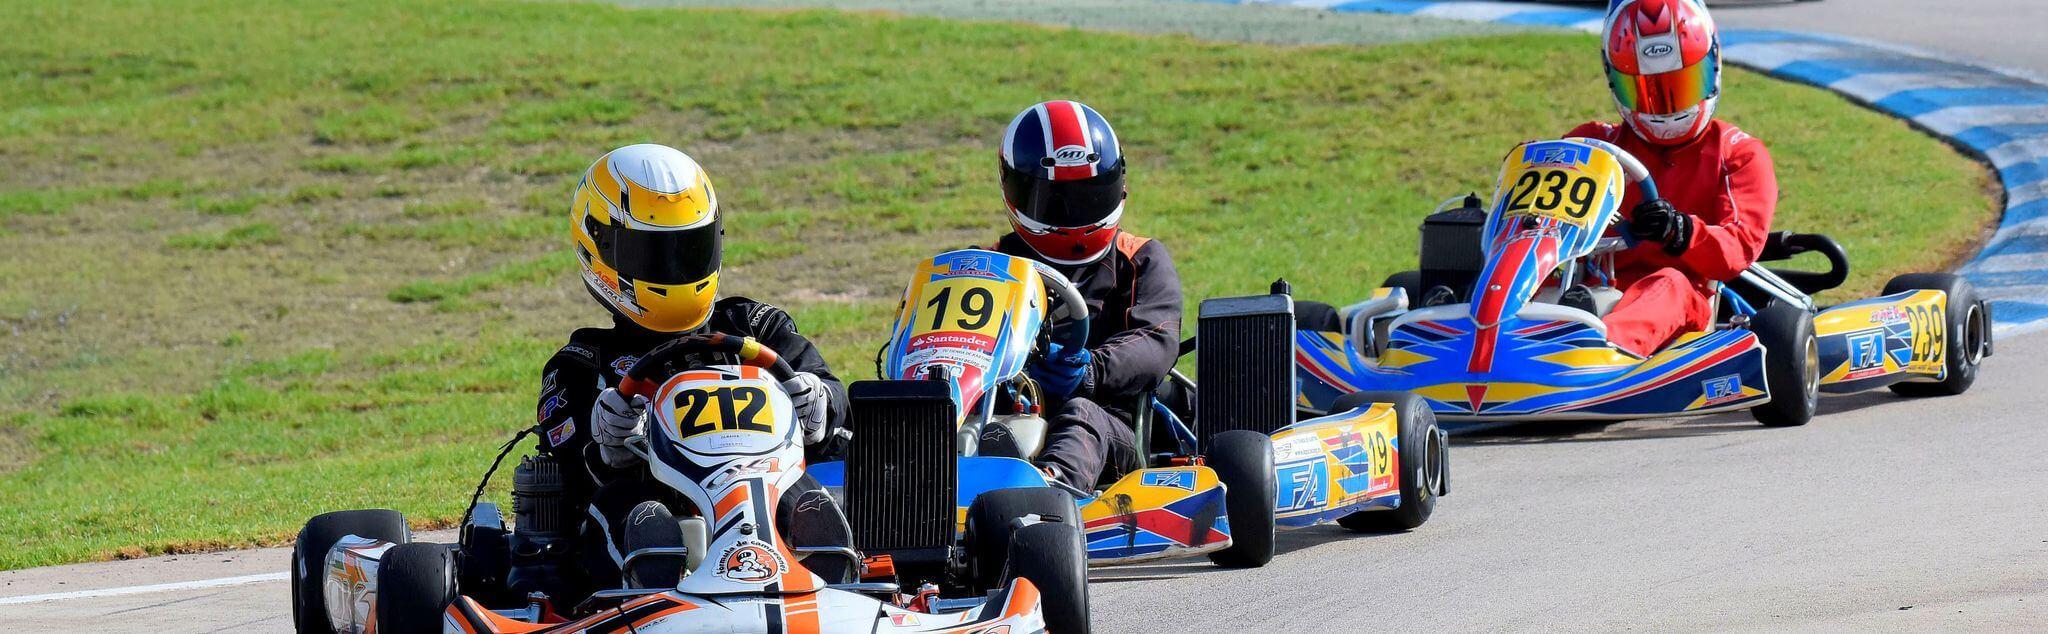 Karting 在 Doubs